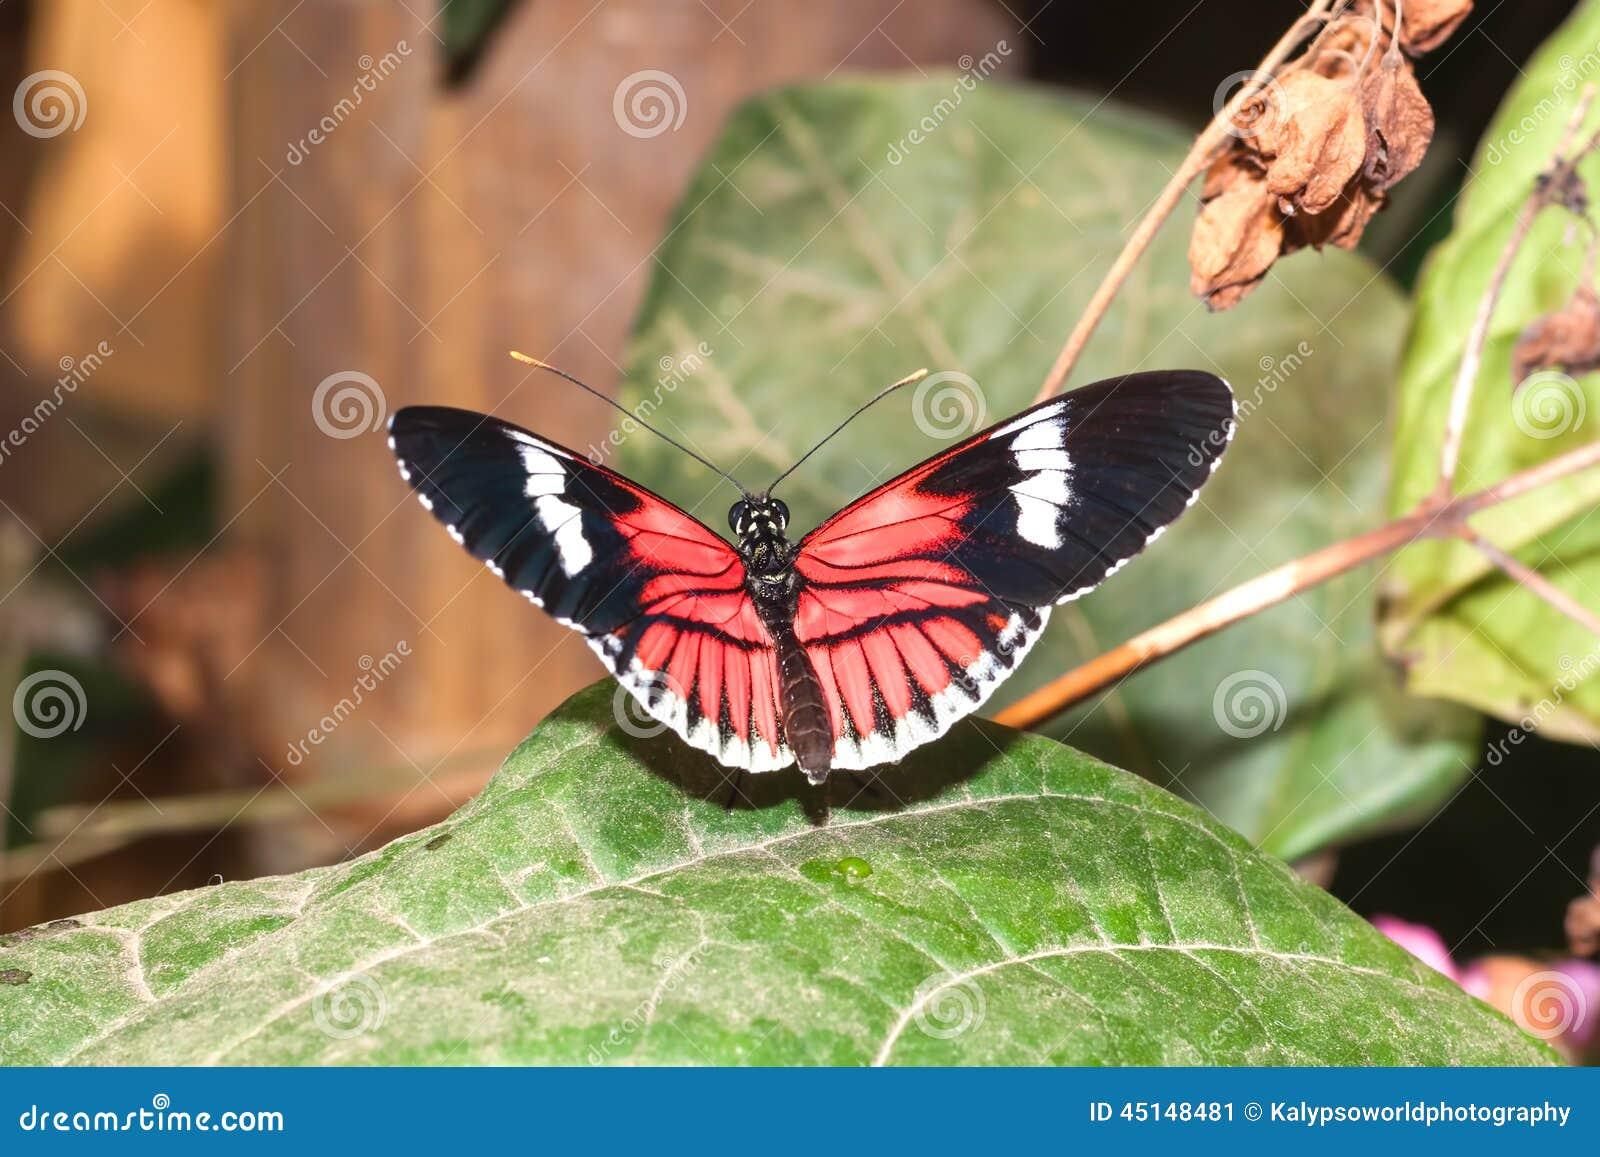 Red Cattle Heart Swallowtail Butterfly